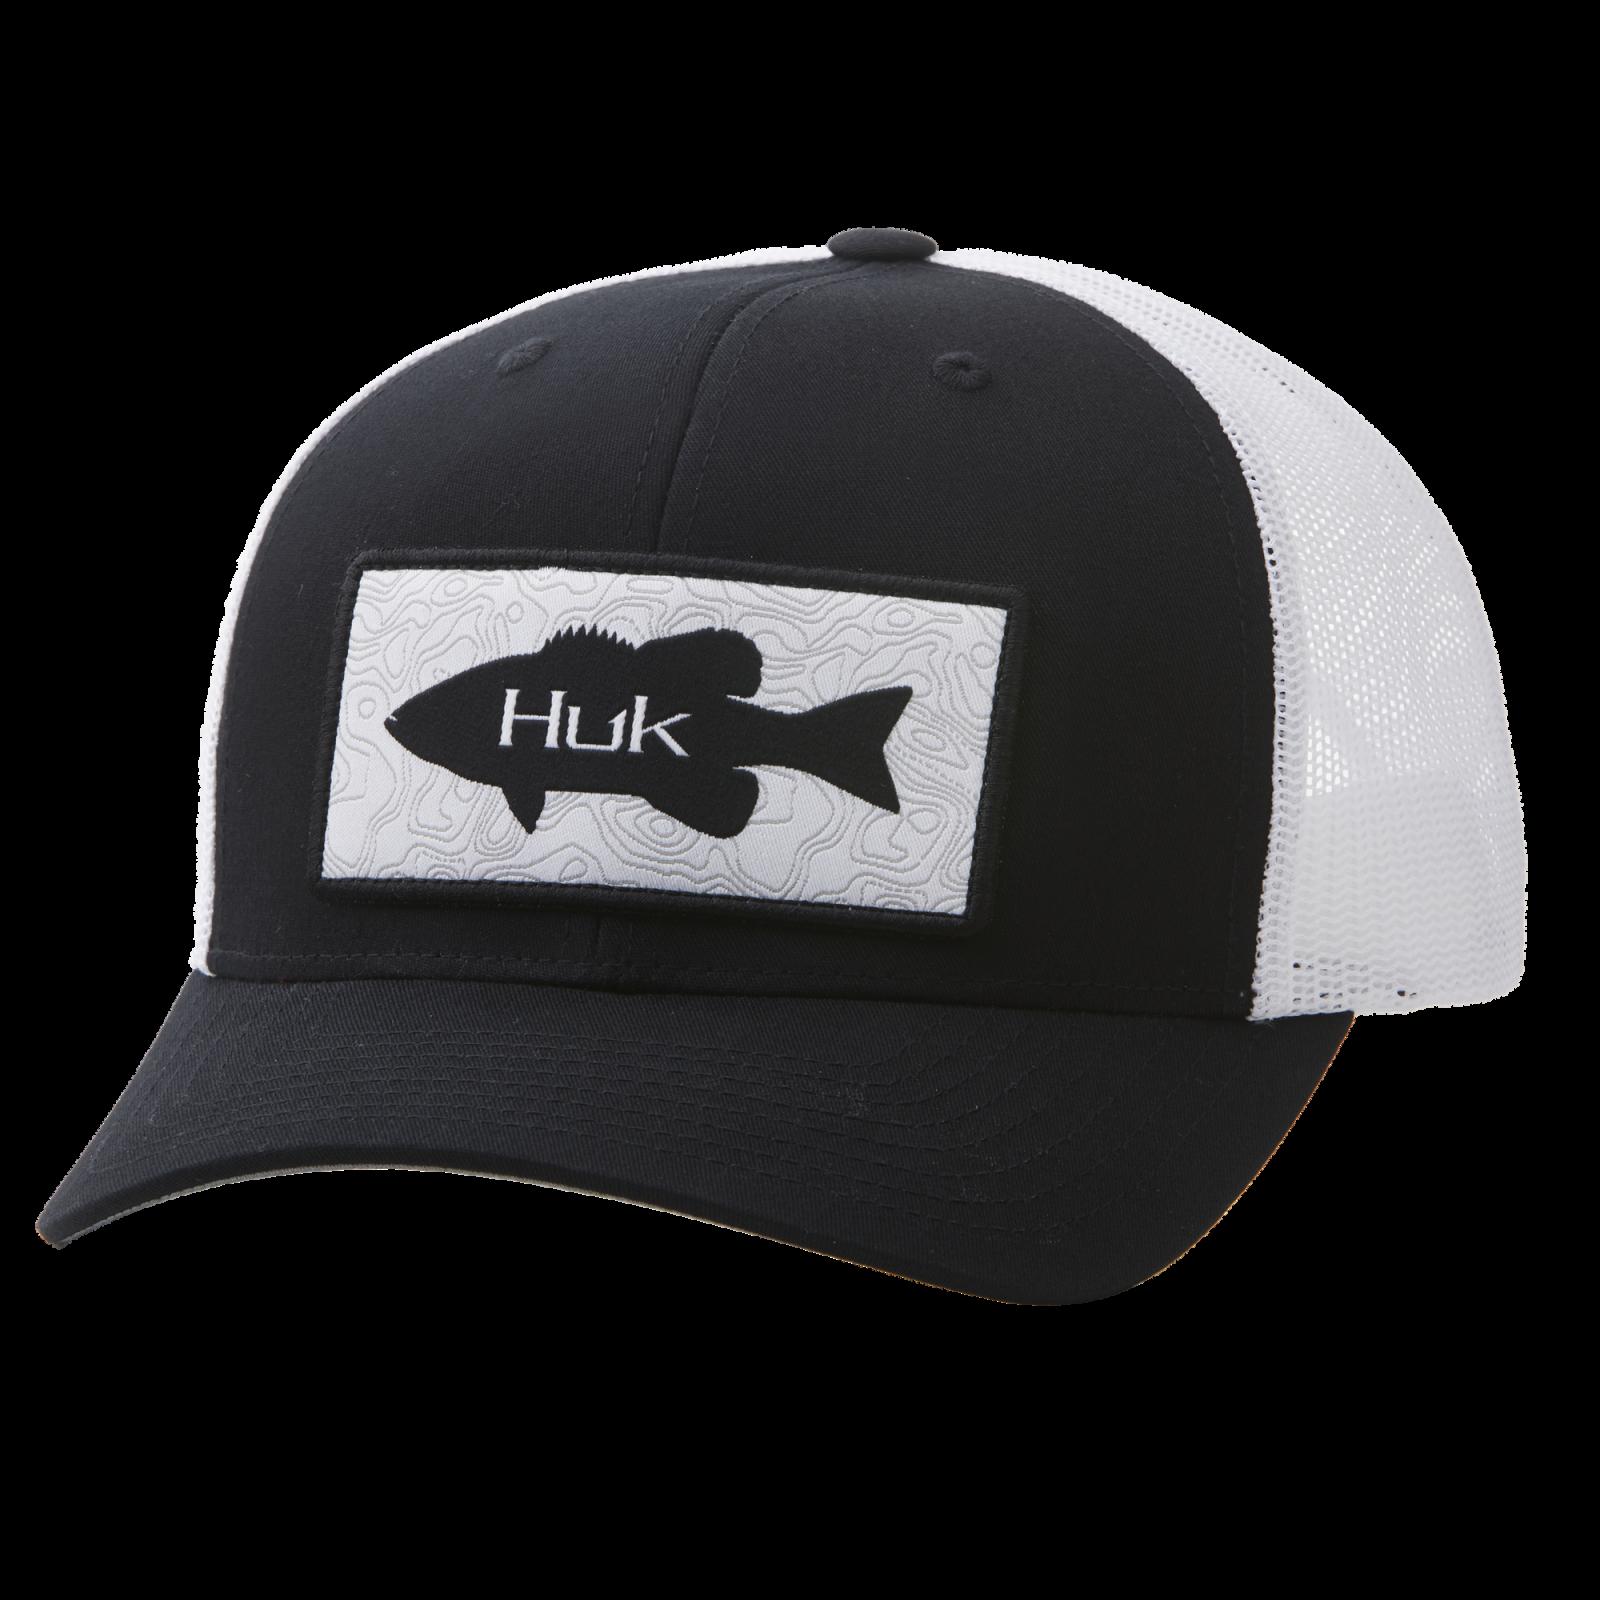 Huk Topo Trucker Hat